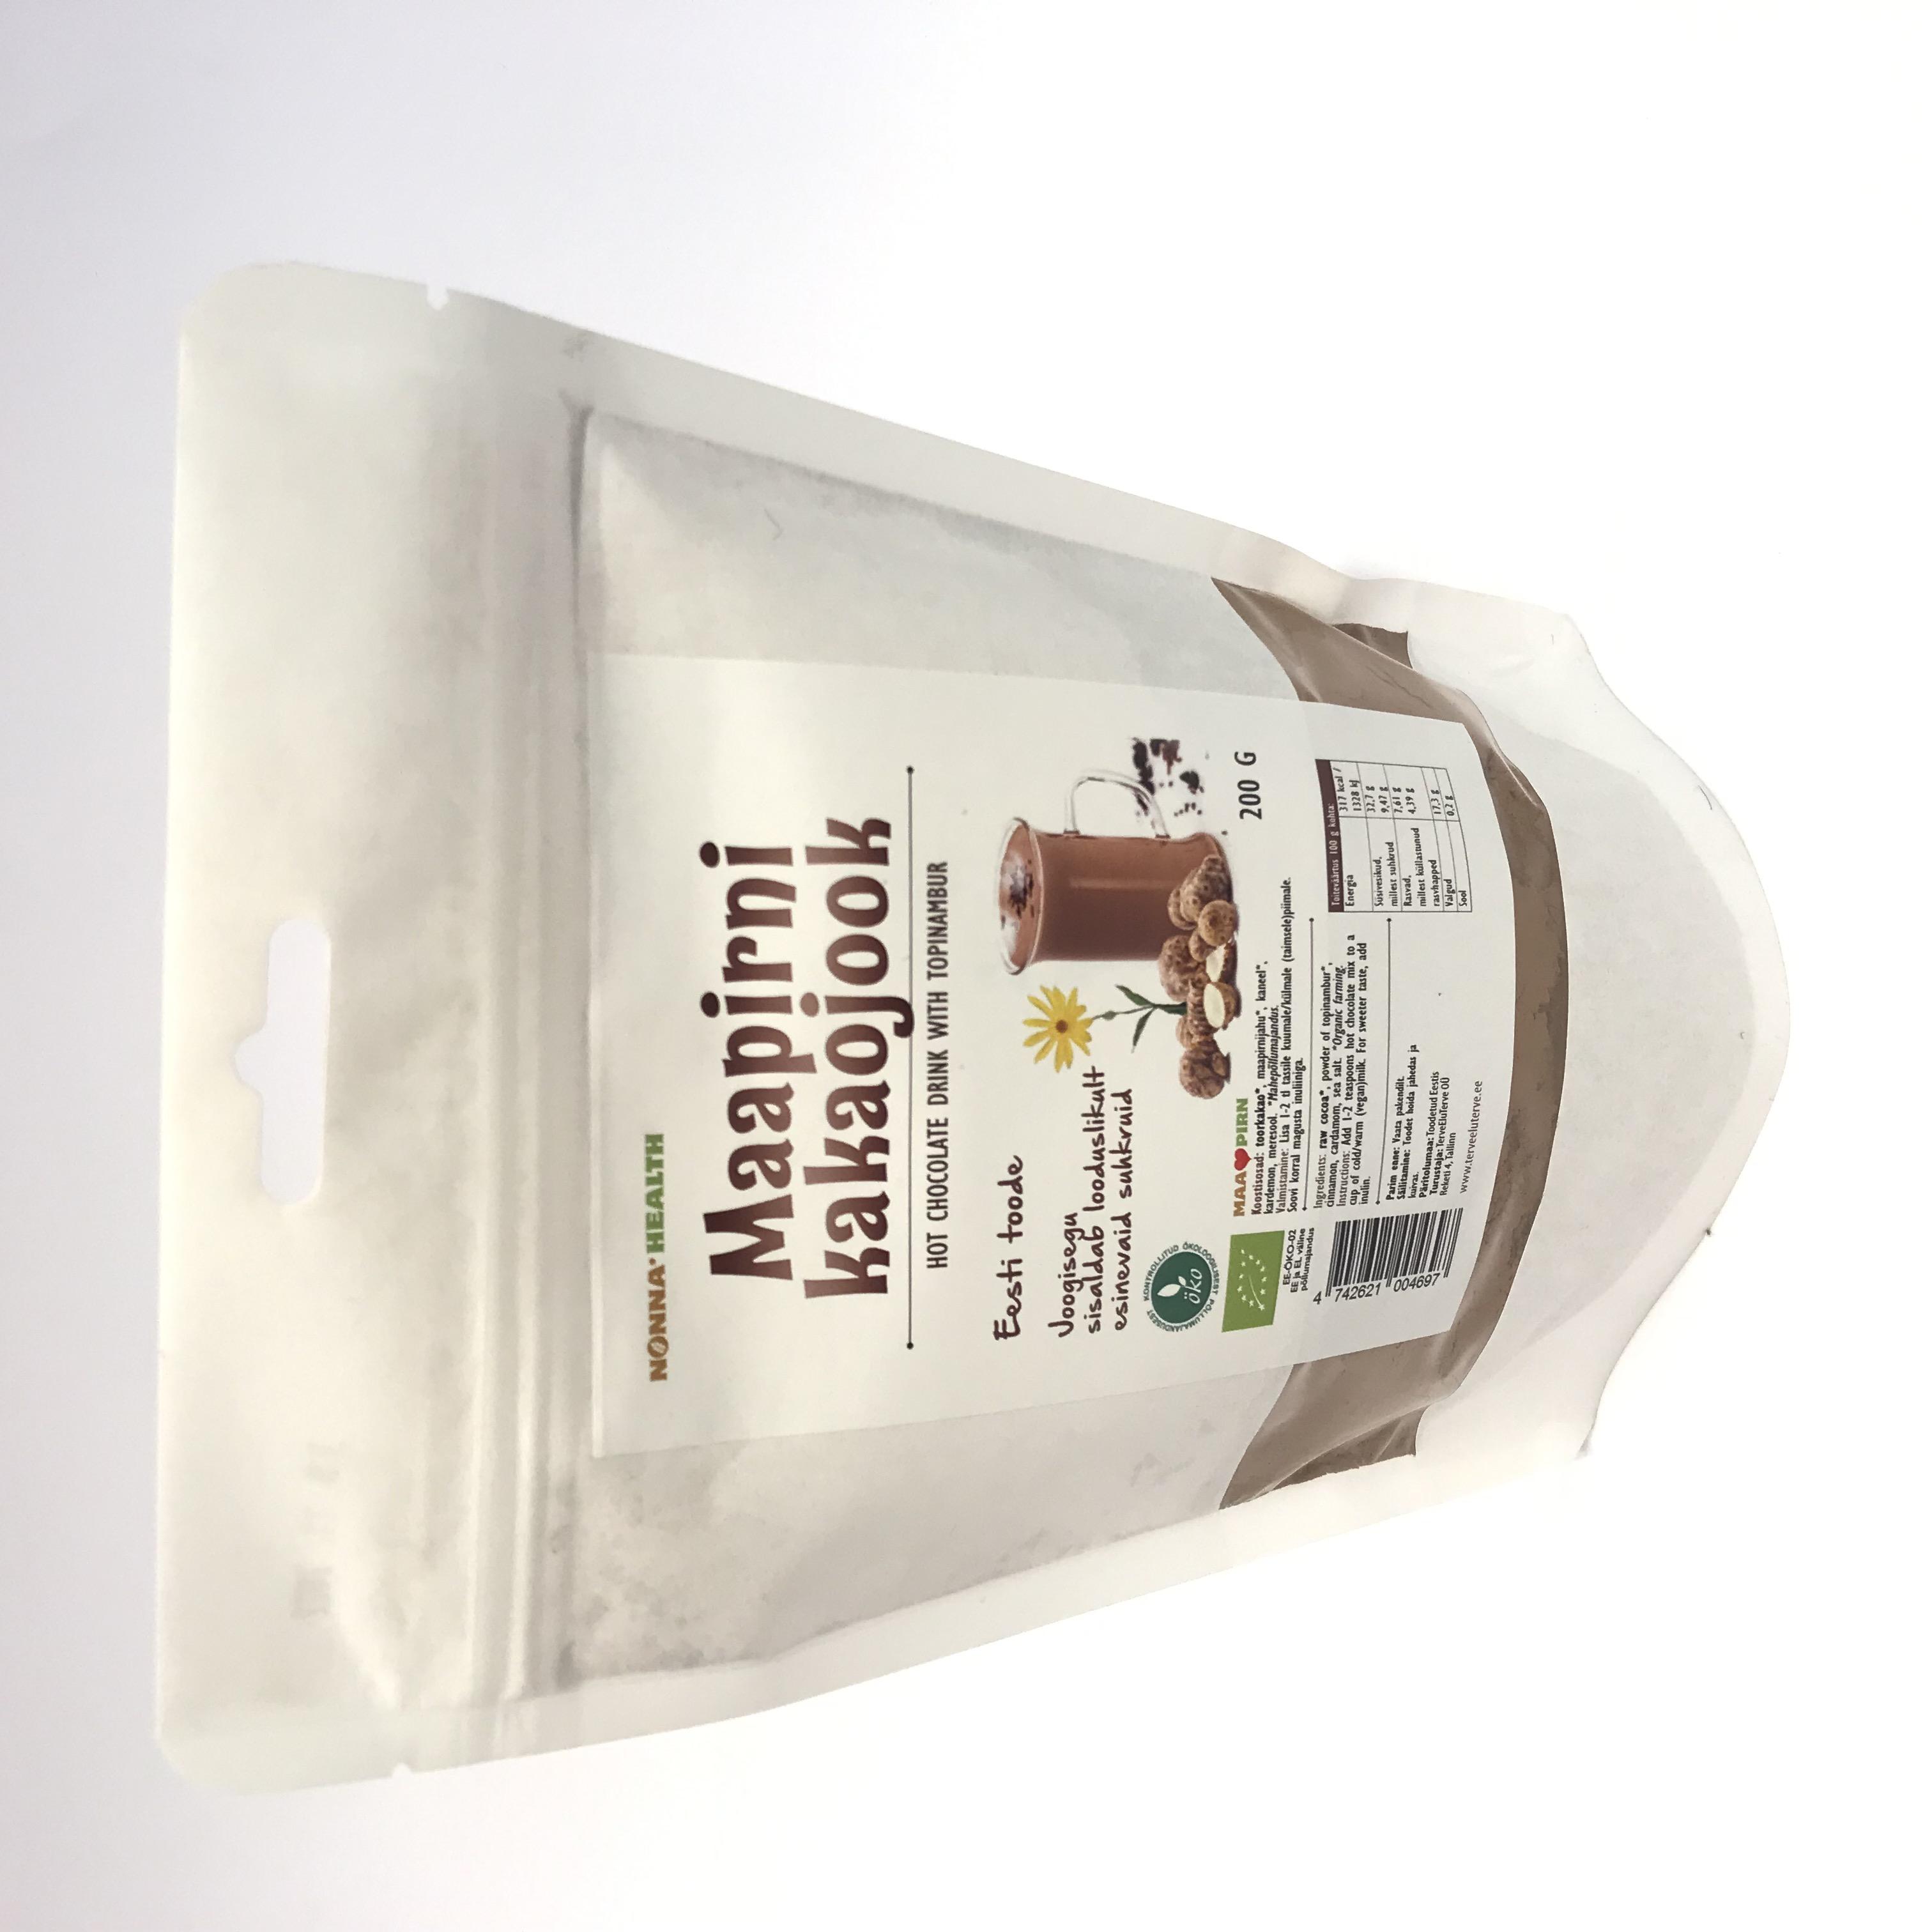 maapirni kakaojook, 200g (2824)